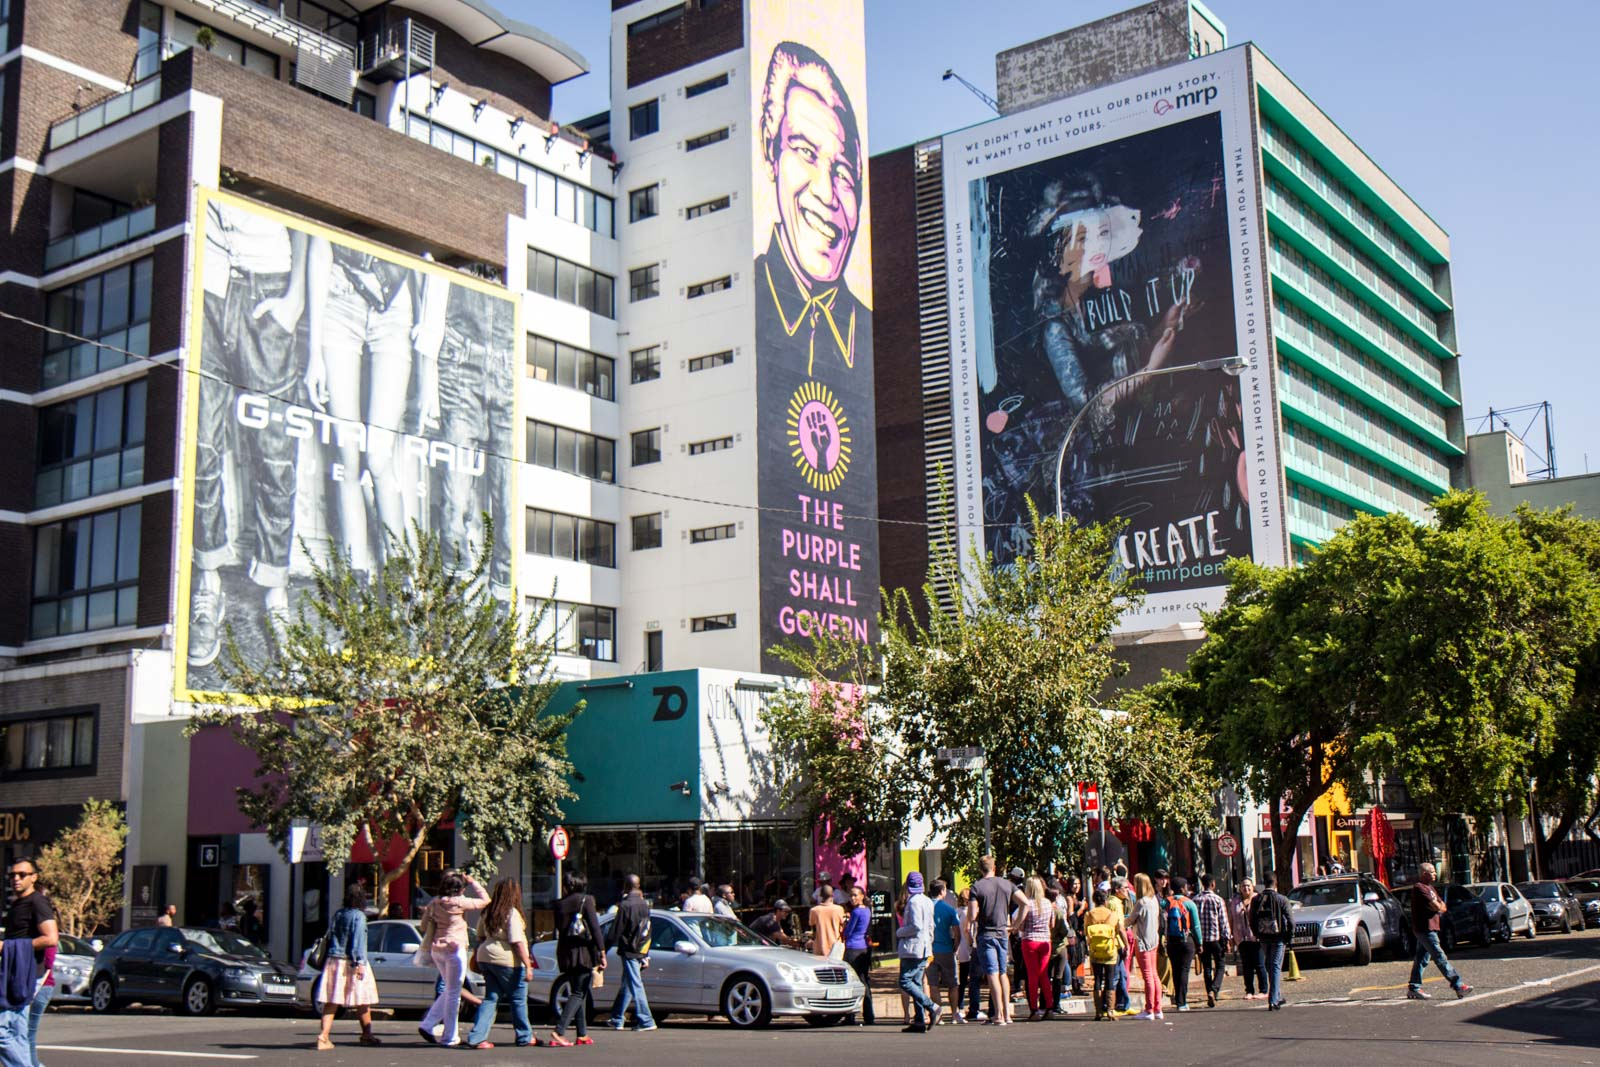 Braamfontein, Johannesburg, South Africa